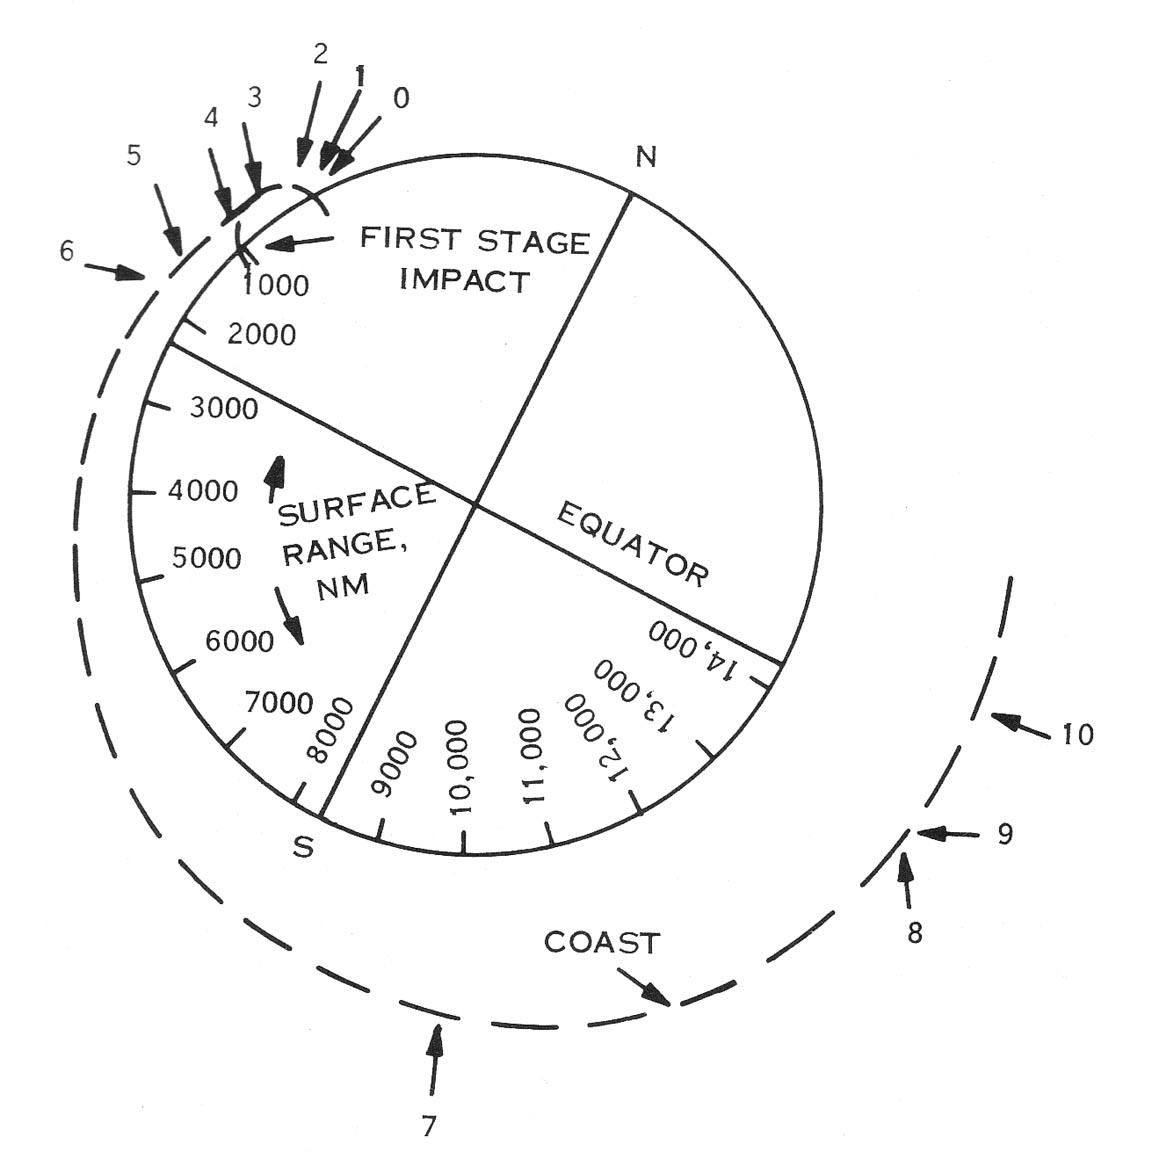 Erts flight profile landsat science rh landsat gsfc nasa gov soil profile diagram people profile sketches